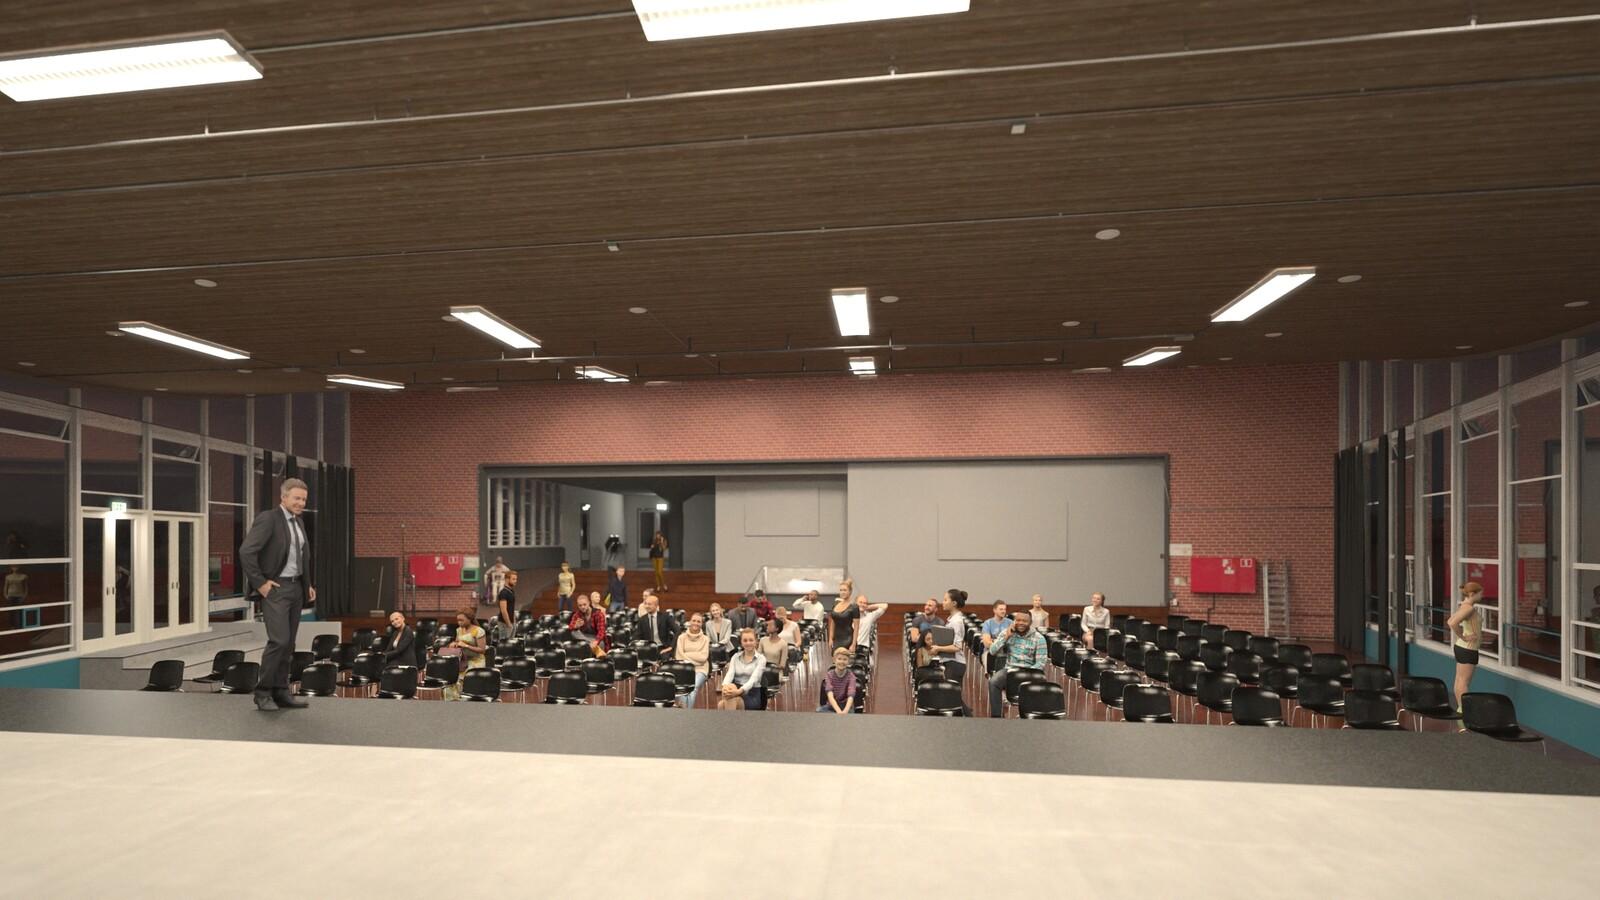 SketchUp 2021 + Thea Render V3 Broedplaats LELY (The Lely Incubator) Auditorium Amsterdam Showroom Final-Scene 7B HD1080 1536 sp 18m10s